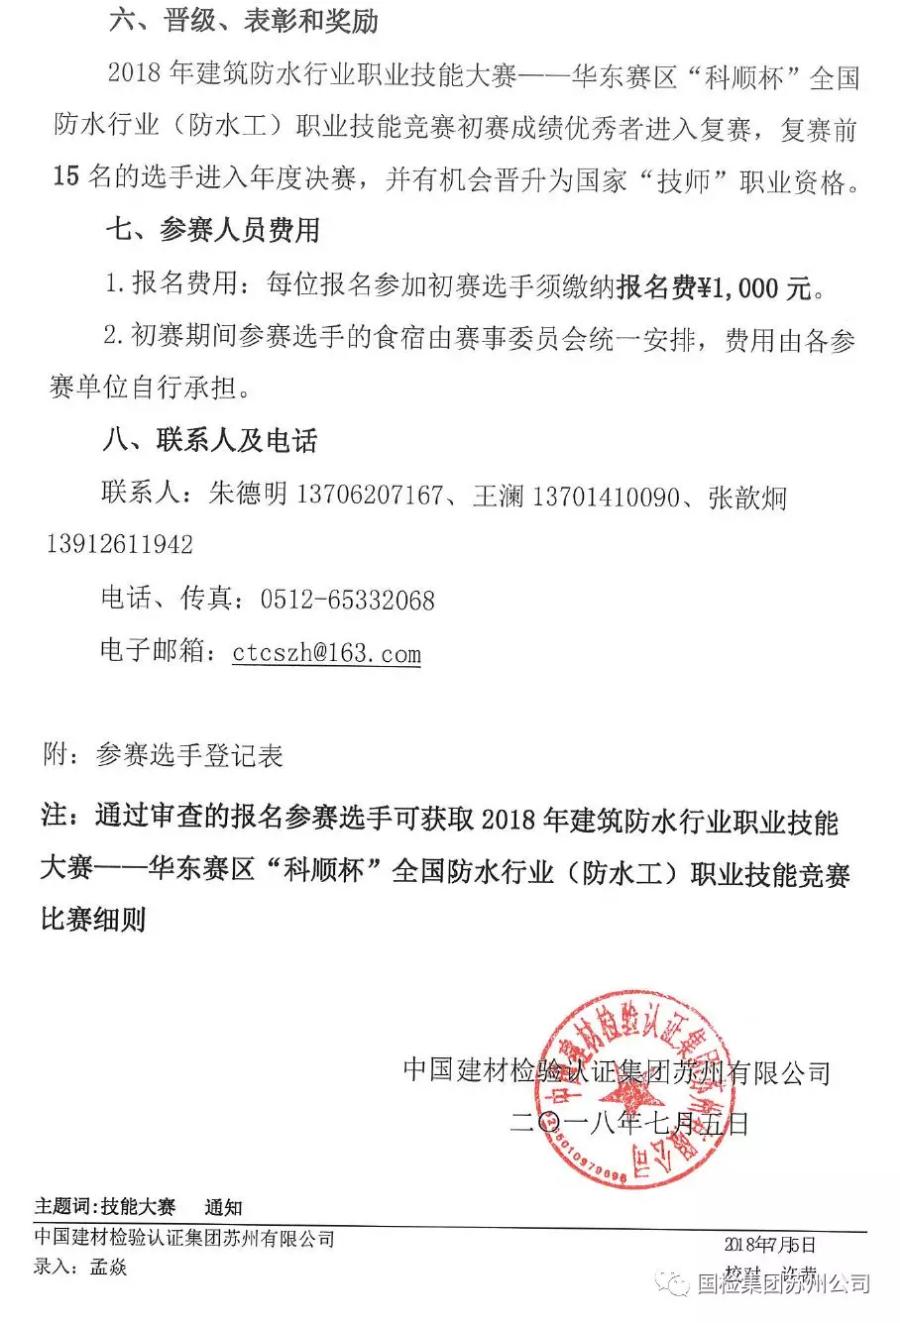 导出图片Wed Jul 11 2018 09_23_06 GMT+0800 (中国标准时间).png